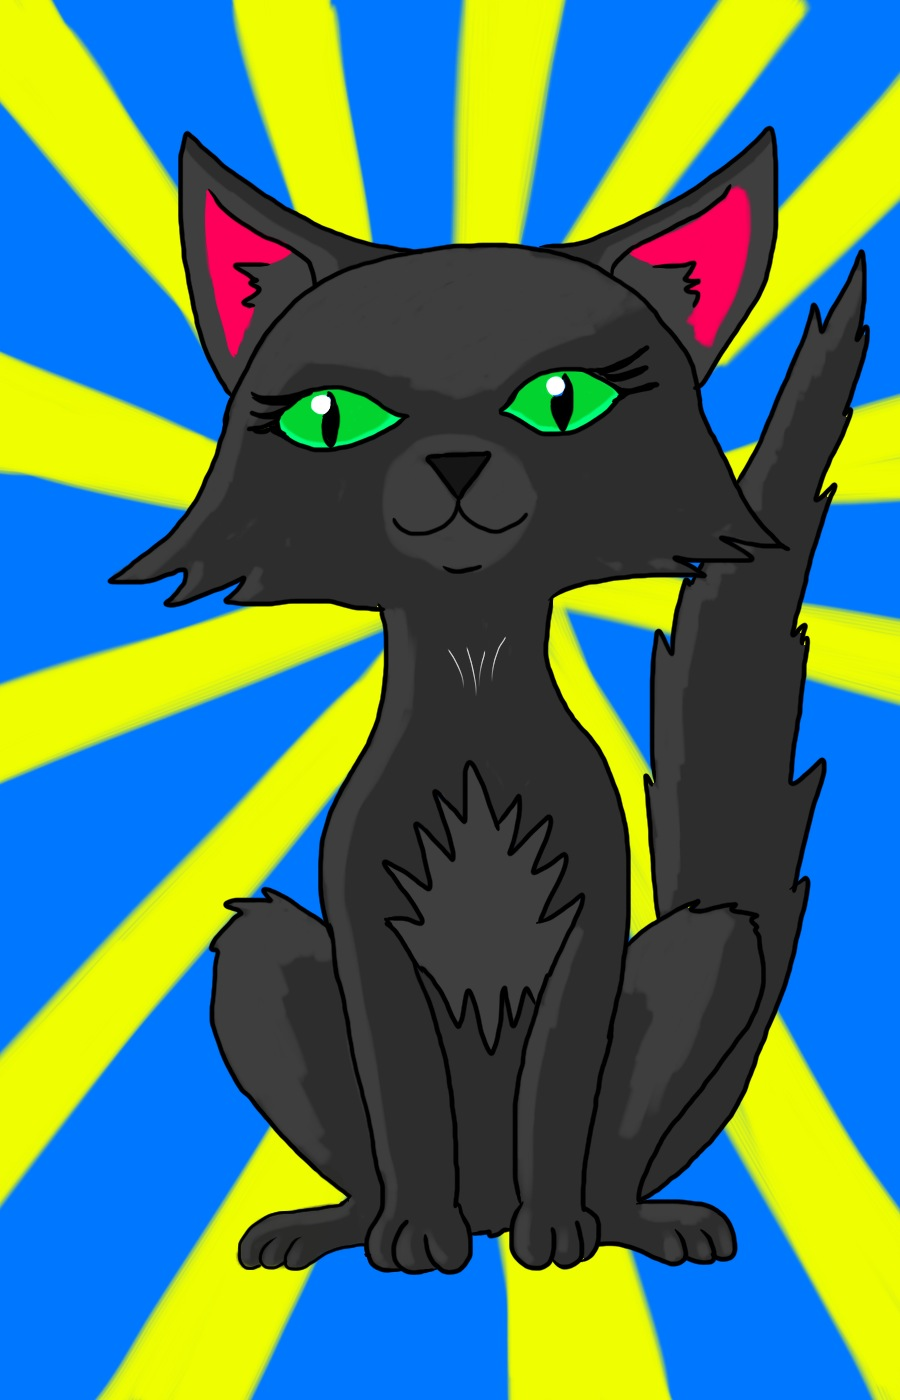 Manga cat: Mia